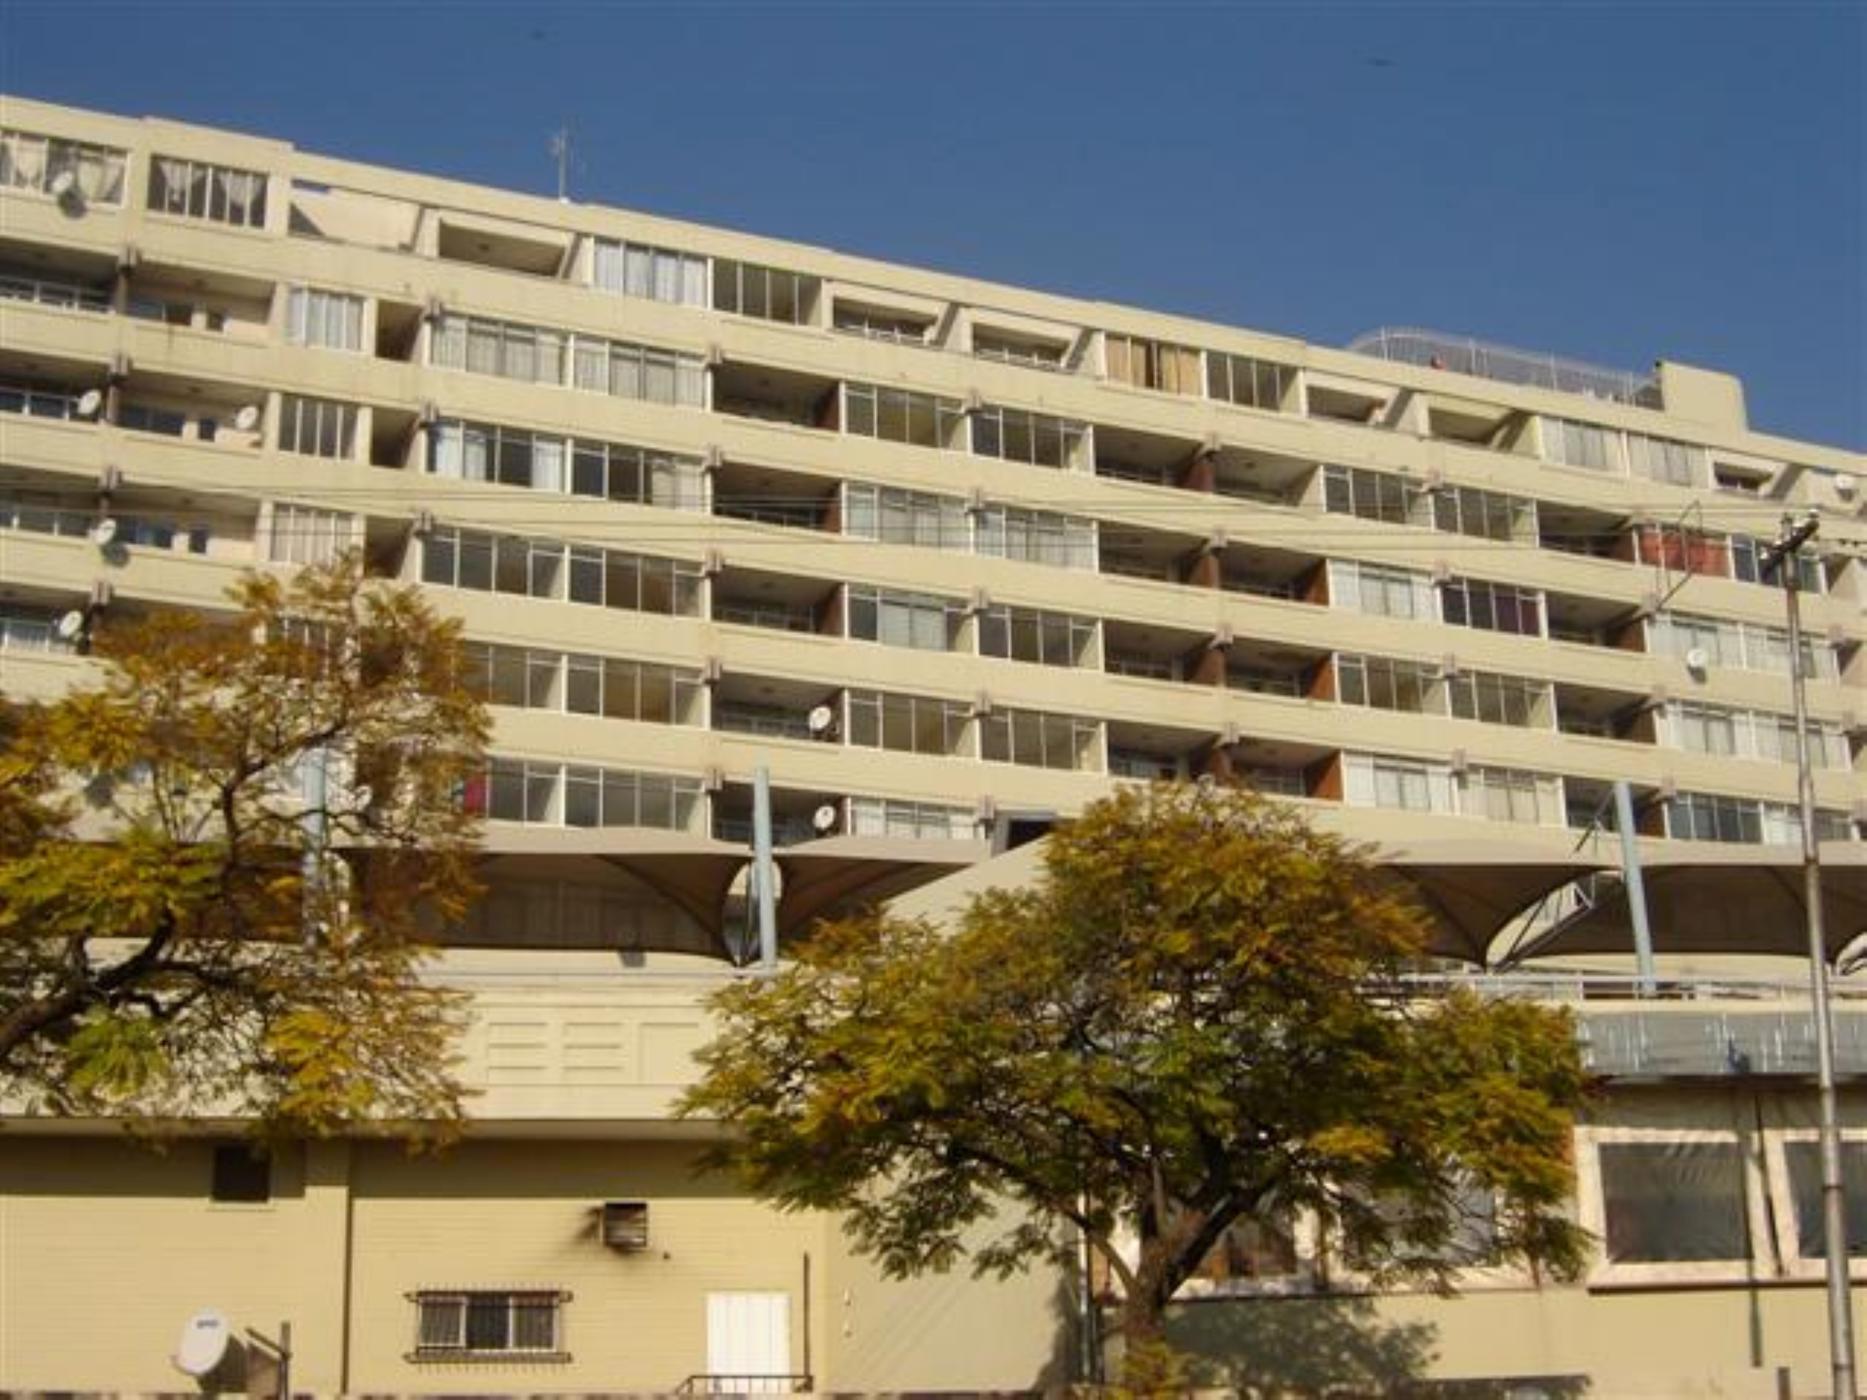 2 Bedroom Bachelor Apartment To Rent Sunnyside Pretoria East